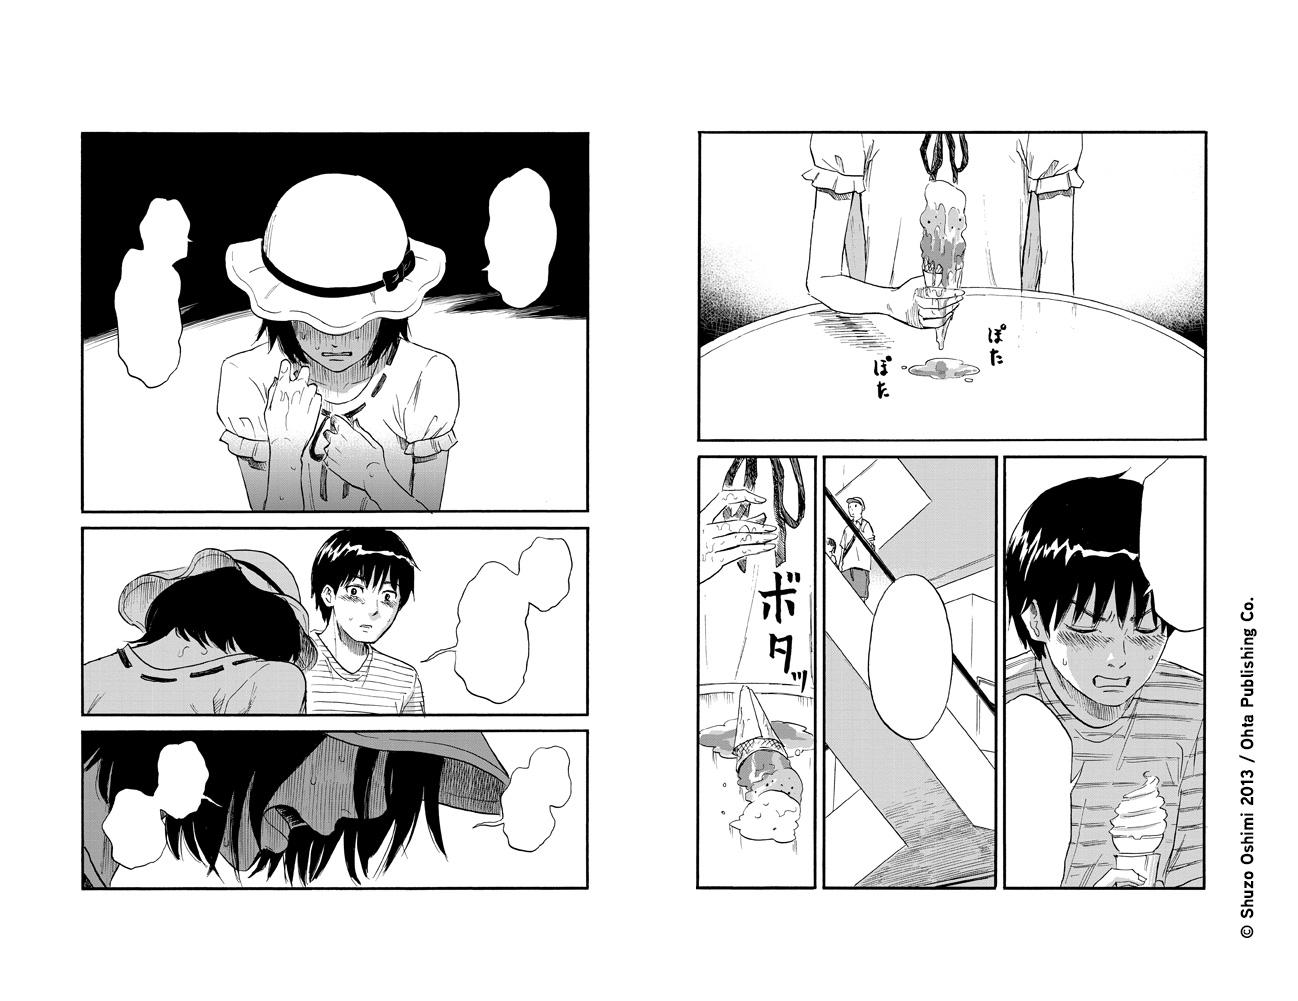 Shino ne sait pas dire son nom